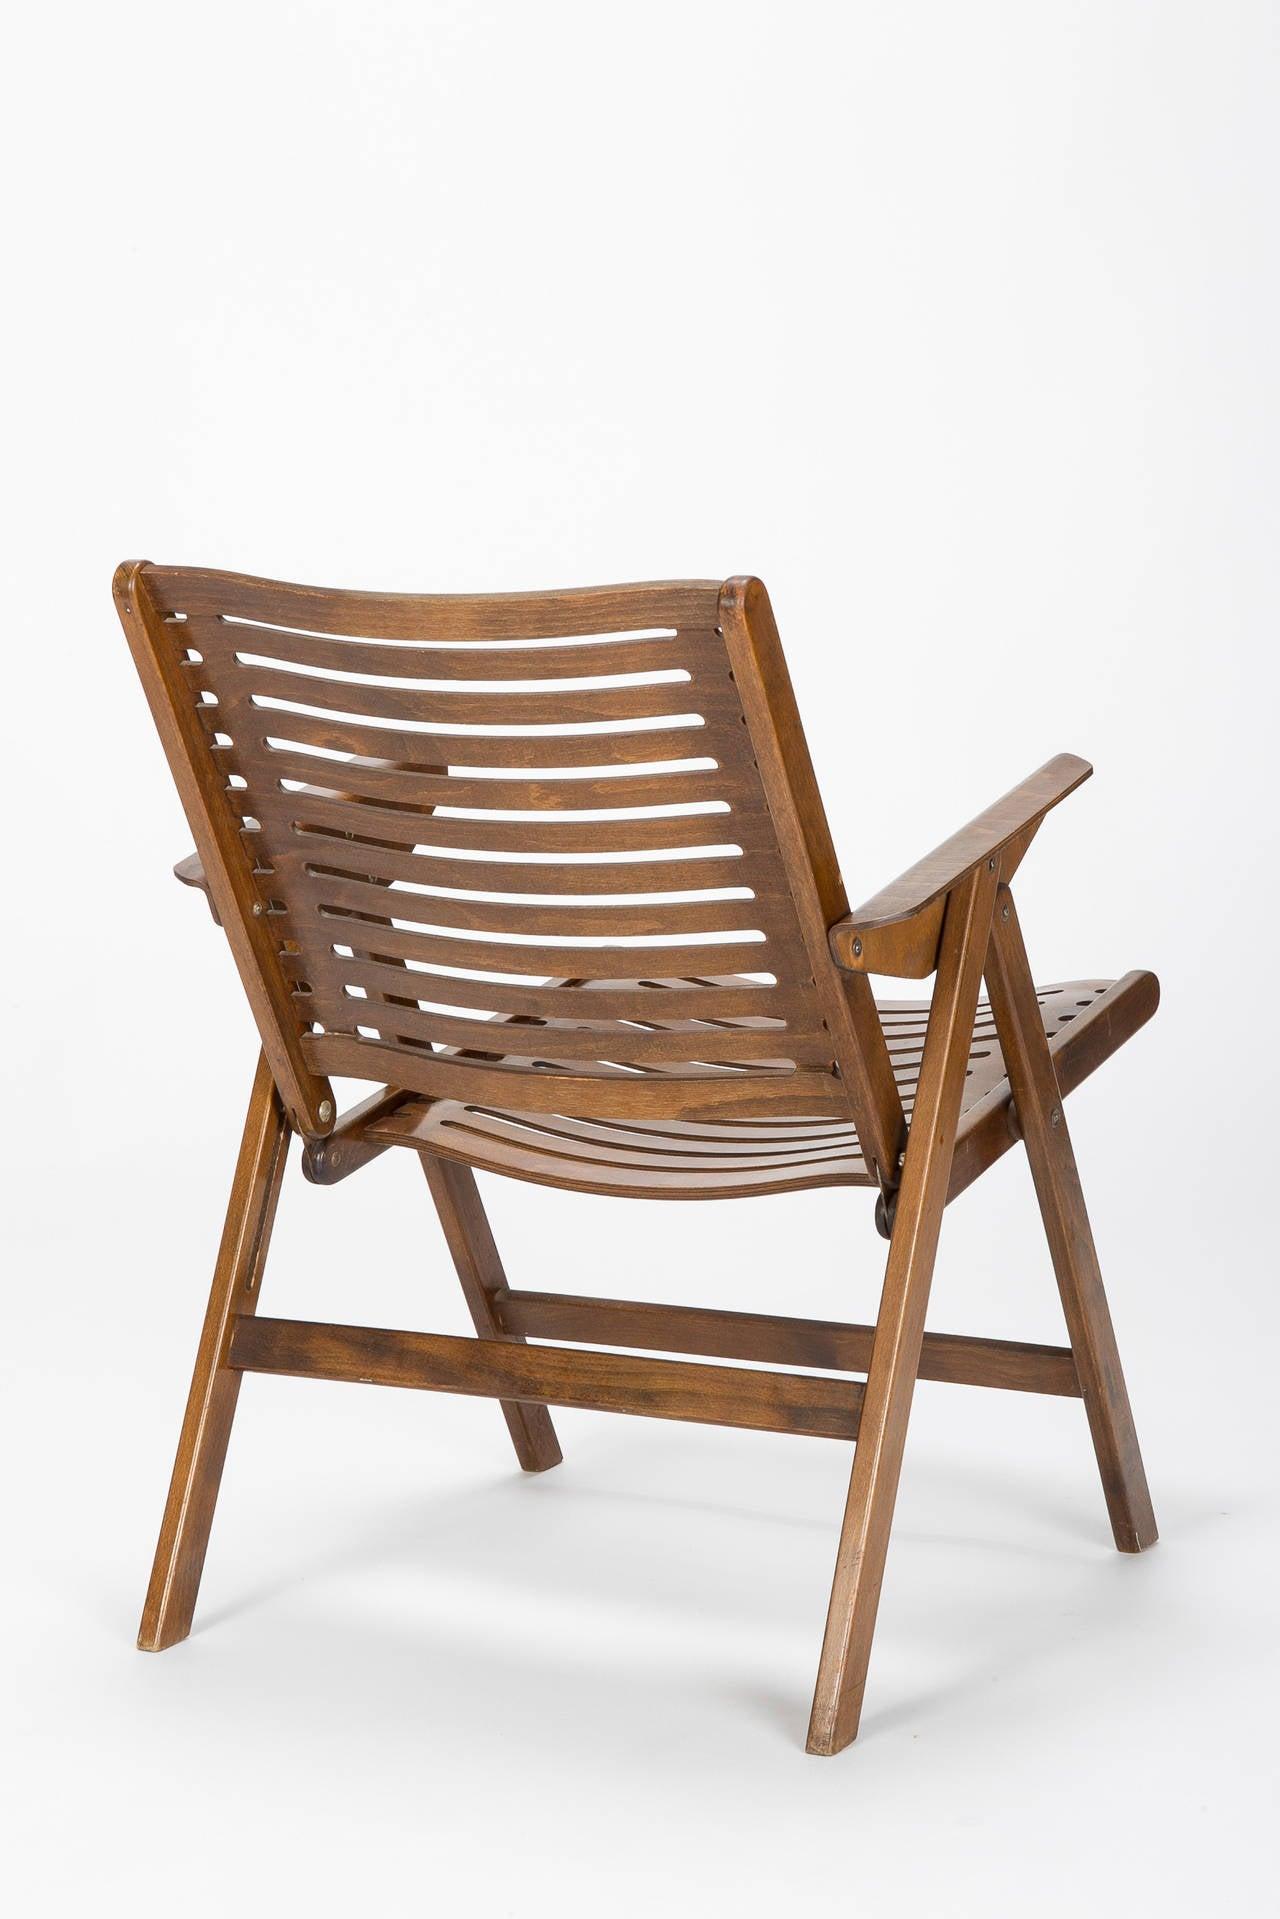 Slovenian Folding Chair Rex By Nico Kralj 1950s At 1stdibs